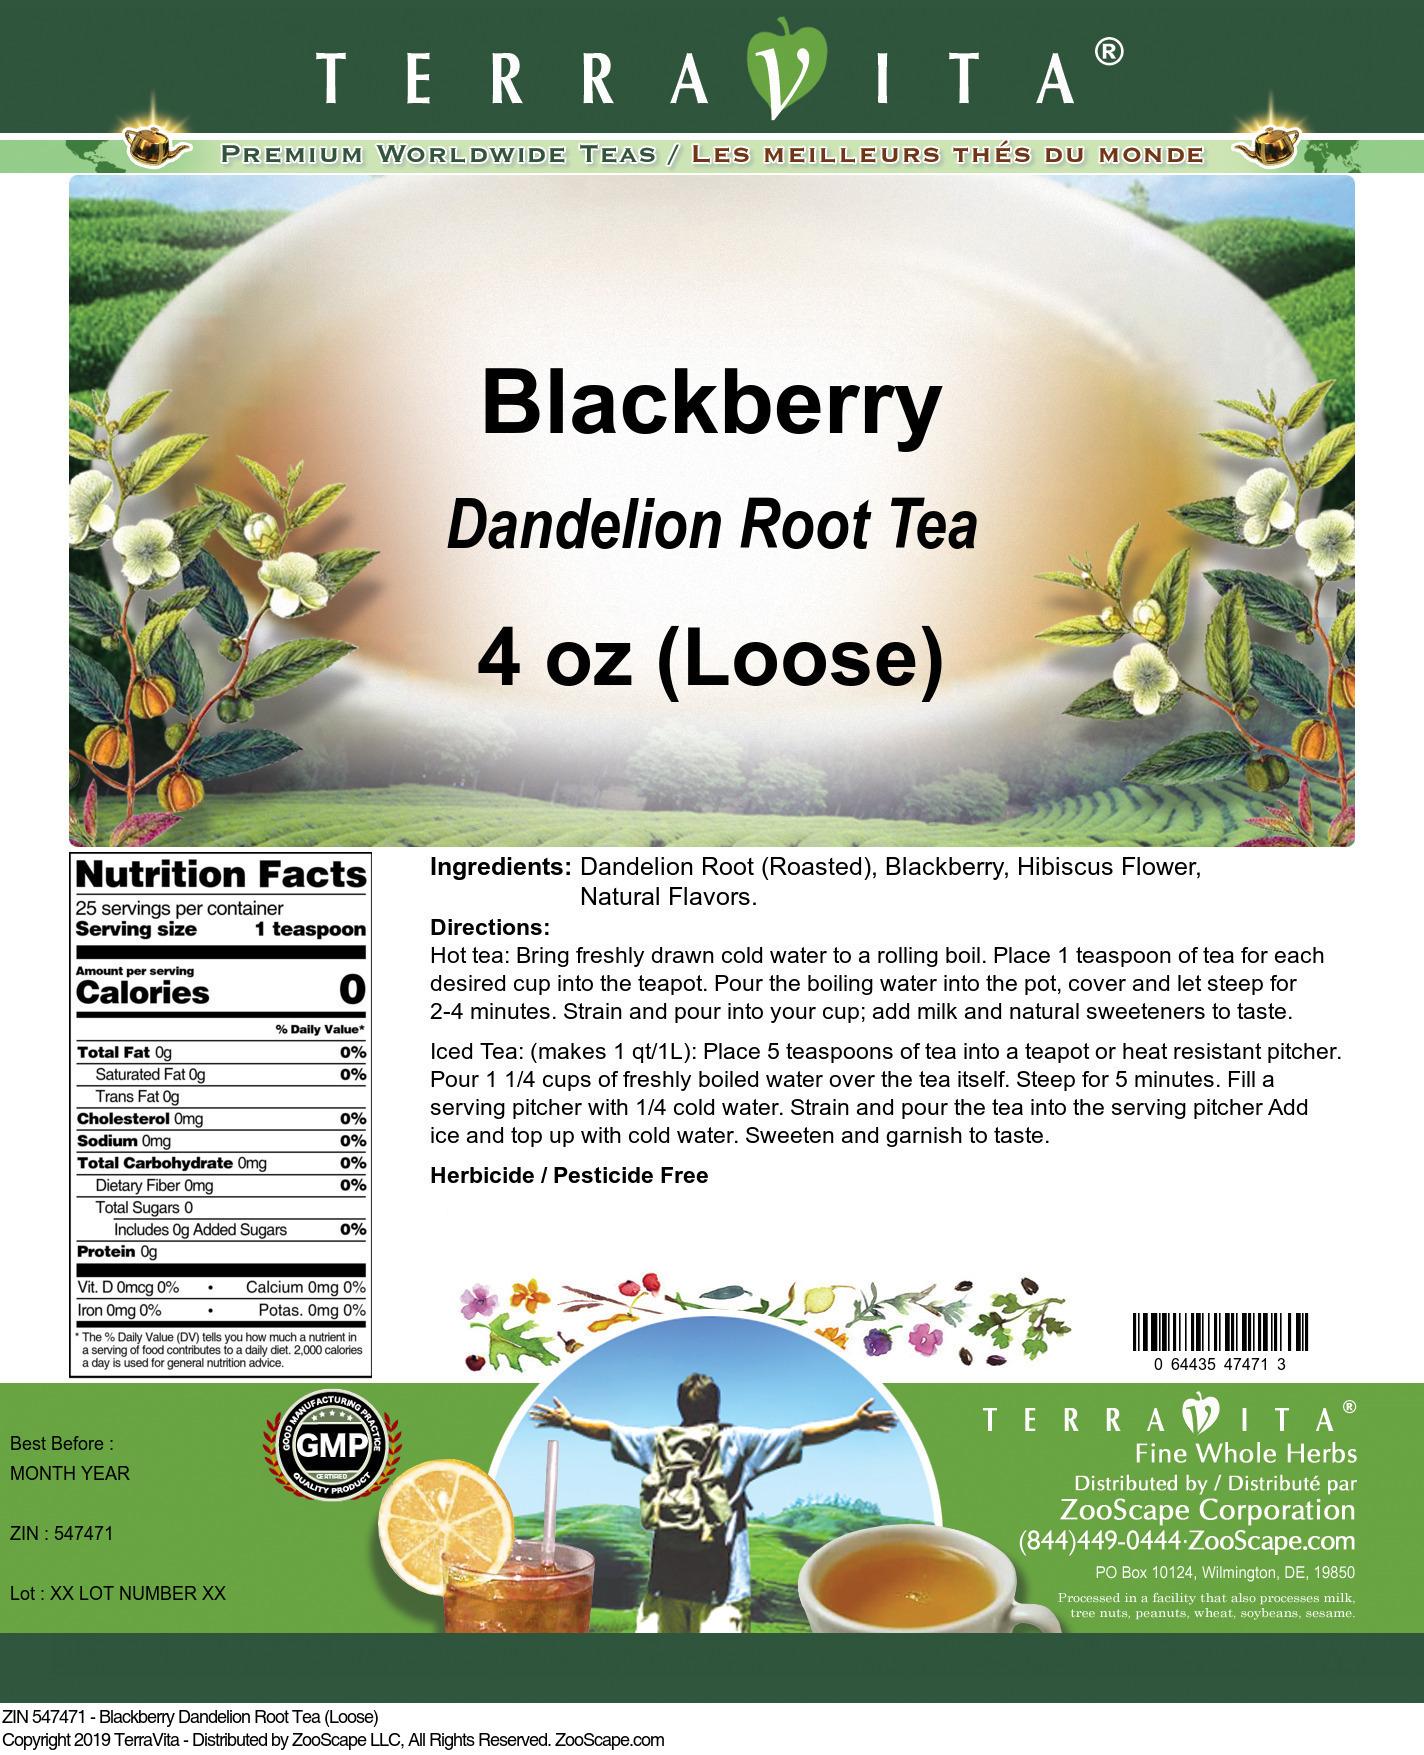 Blackberry Dandelion Root Tea (Loose)